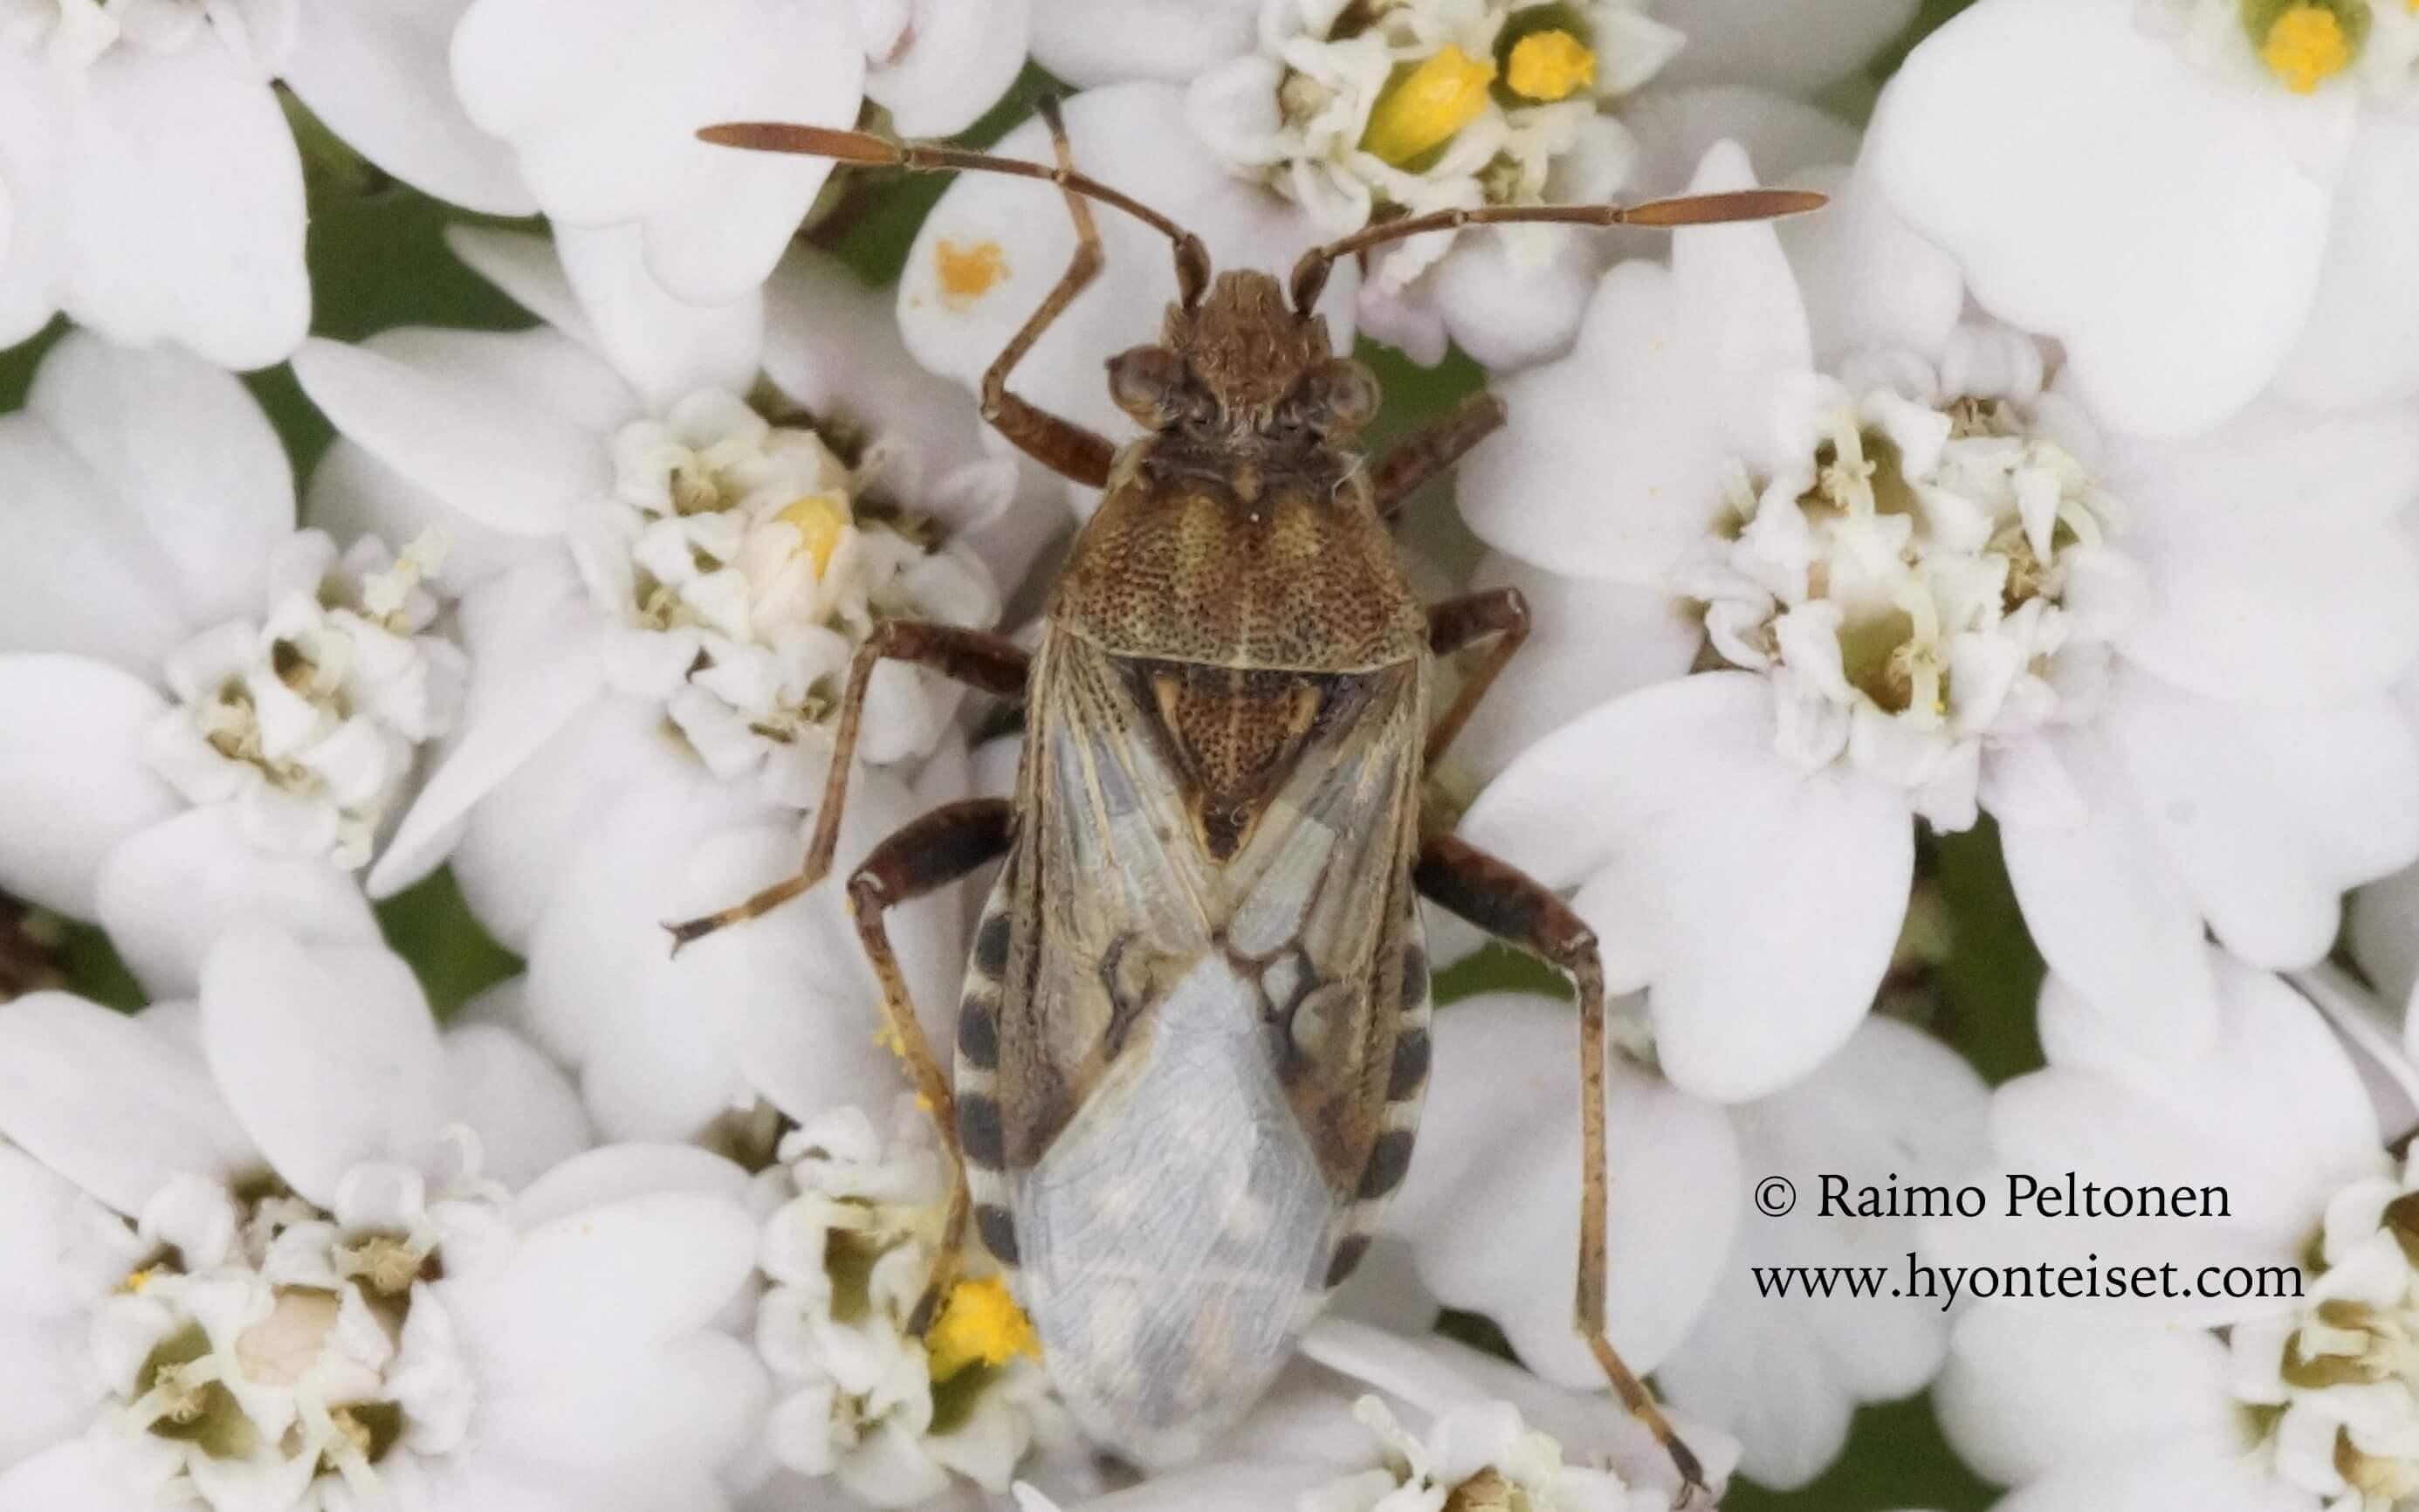 Stictopleurus cf. crassicornis-ruostekoukorolude (det. Veikko Rinne)